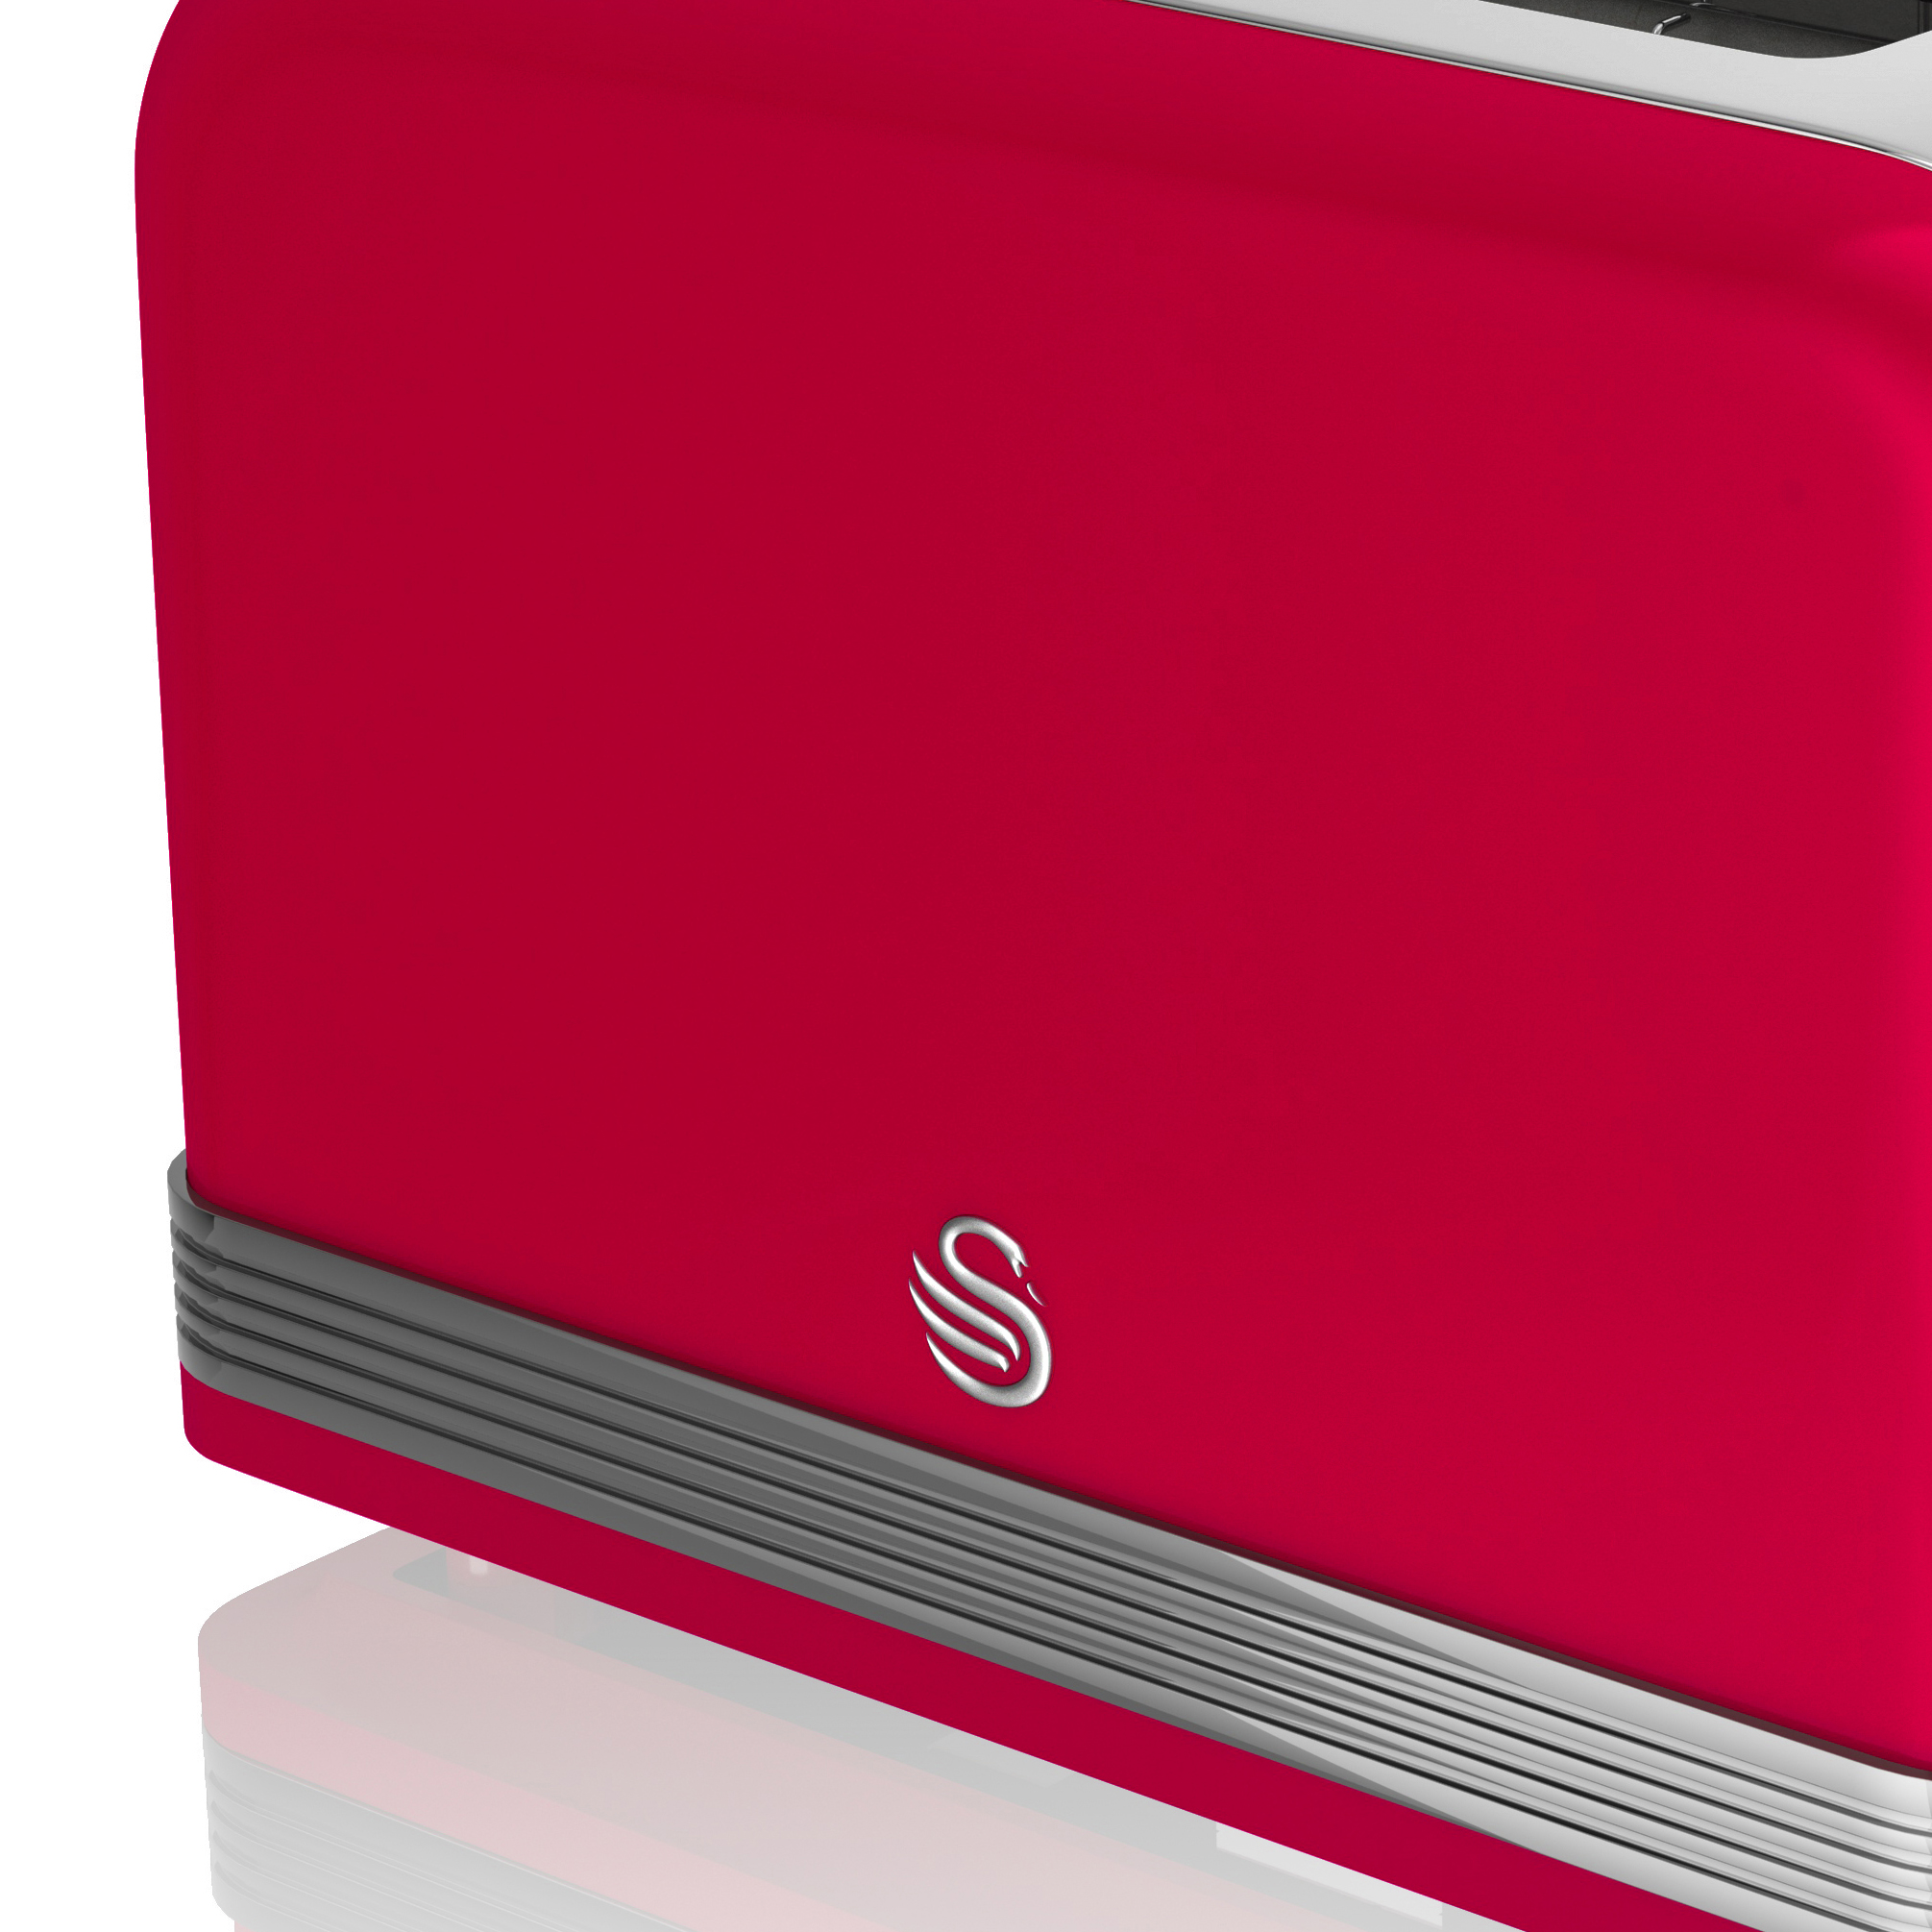 thumbnail 105 - Swan Retro 1.5L Jug Kettle 3KW, 2 Slice Toaster 815W & 20L Digital Microwave Set